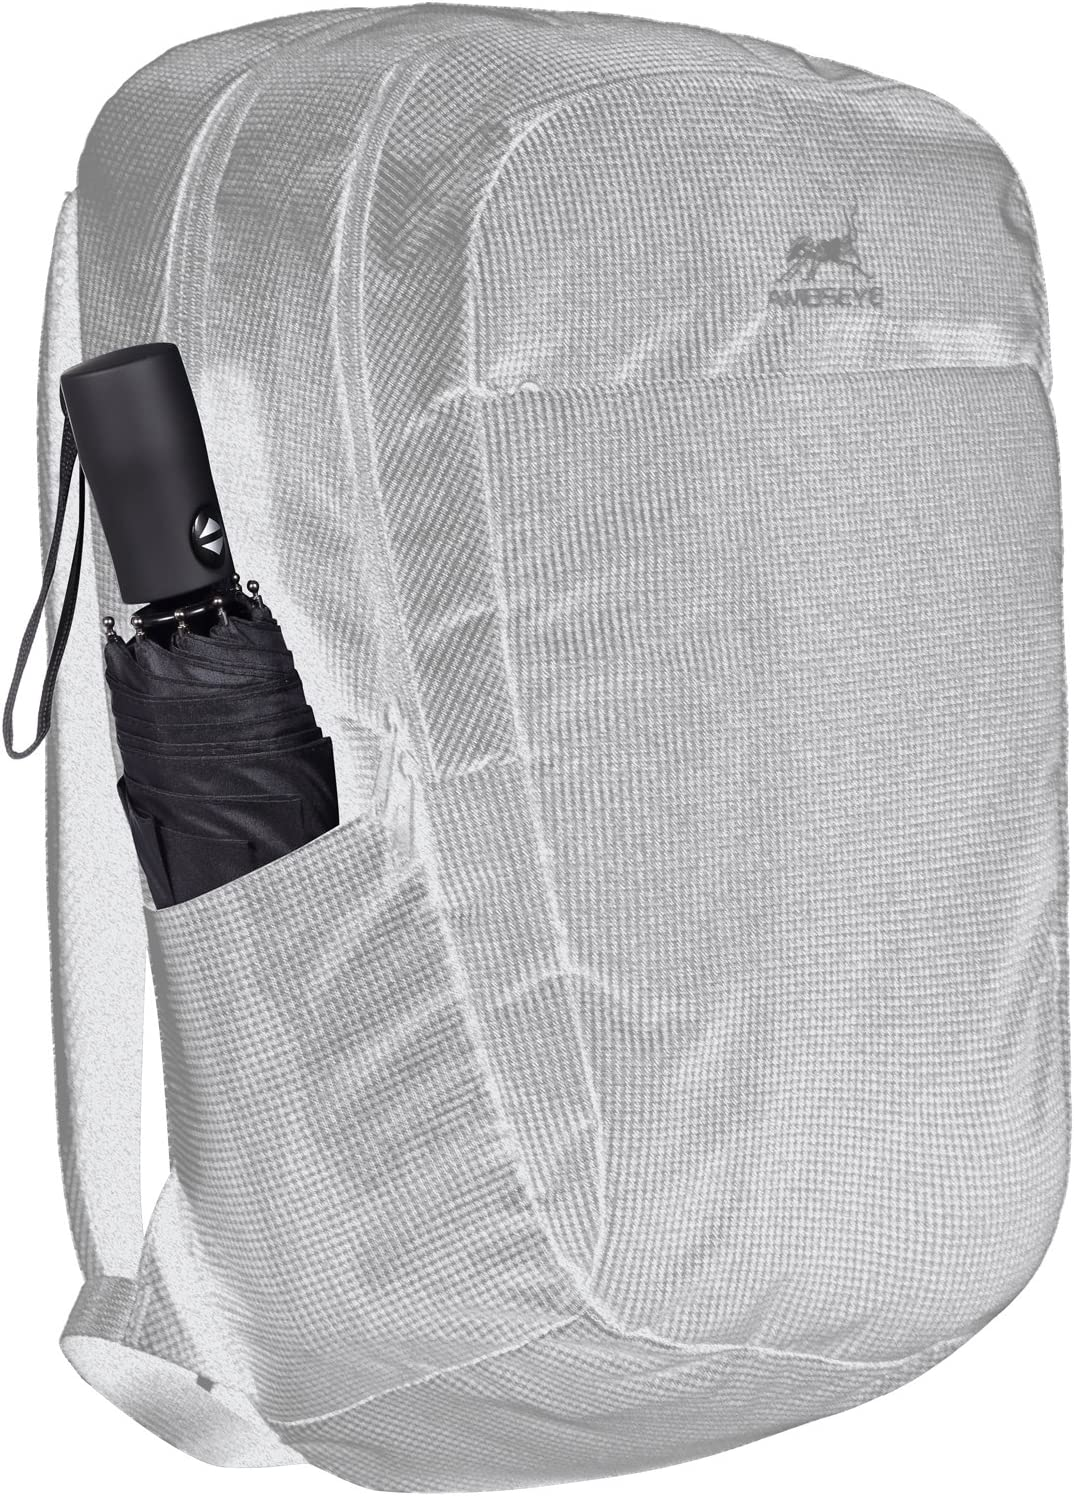 Safe and Portable Famleaf Automatic Folding Umbrella Windproof Anti-Rebound 46 inch Compact Travel Rain Umbrella